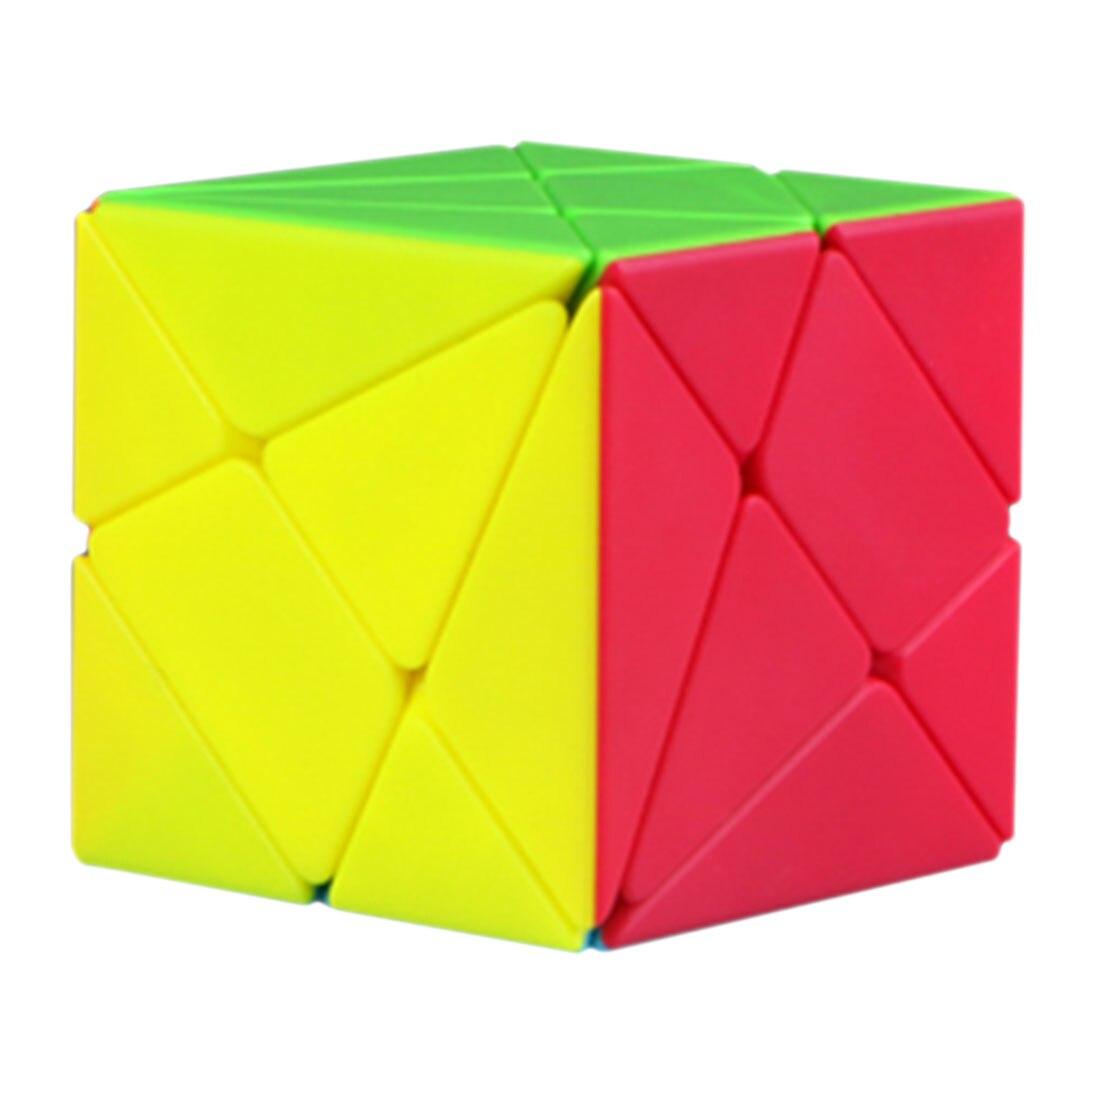 2019 Qiyi Axis Skewcube Cube Magic for Kid Adult Playing Birthday Present Gift- Colorful2019 Qiyi Axis Skewcube Cube Magic for Kid Adult Playing Birthday Present Gift- Colorful